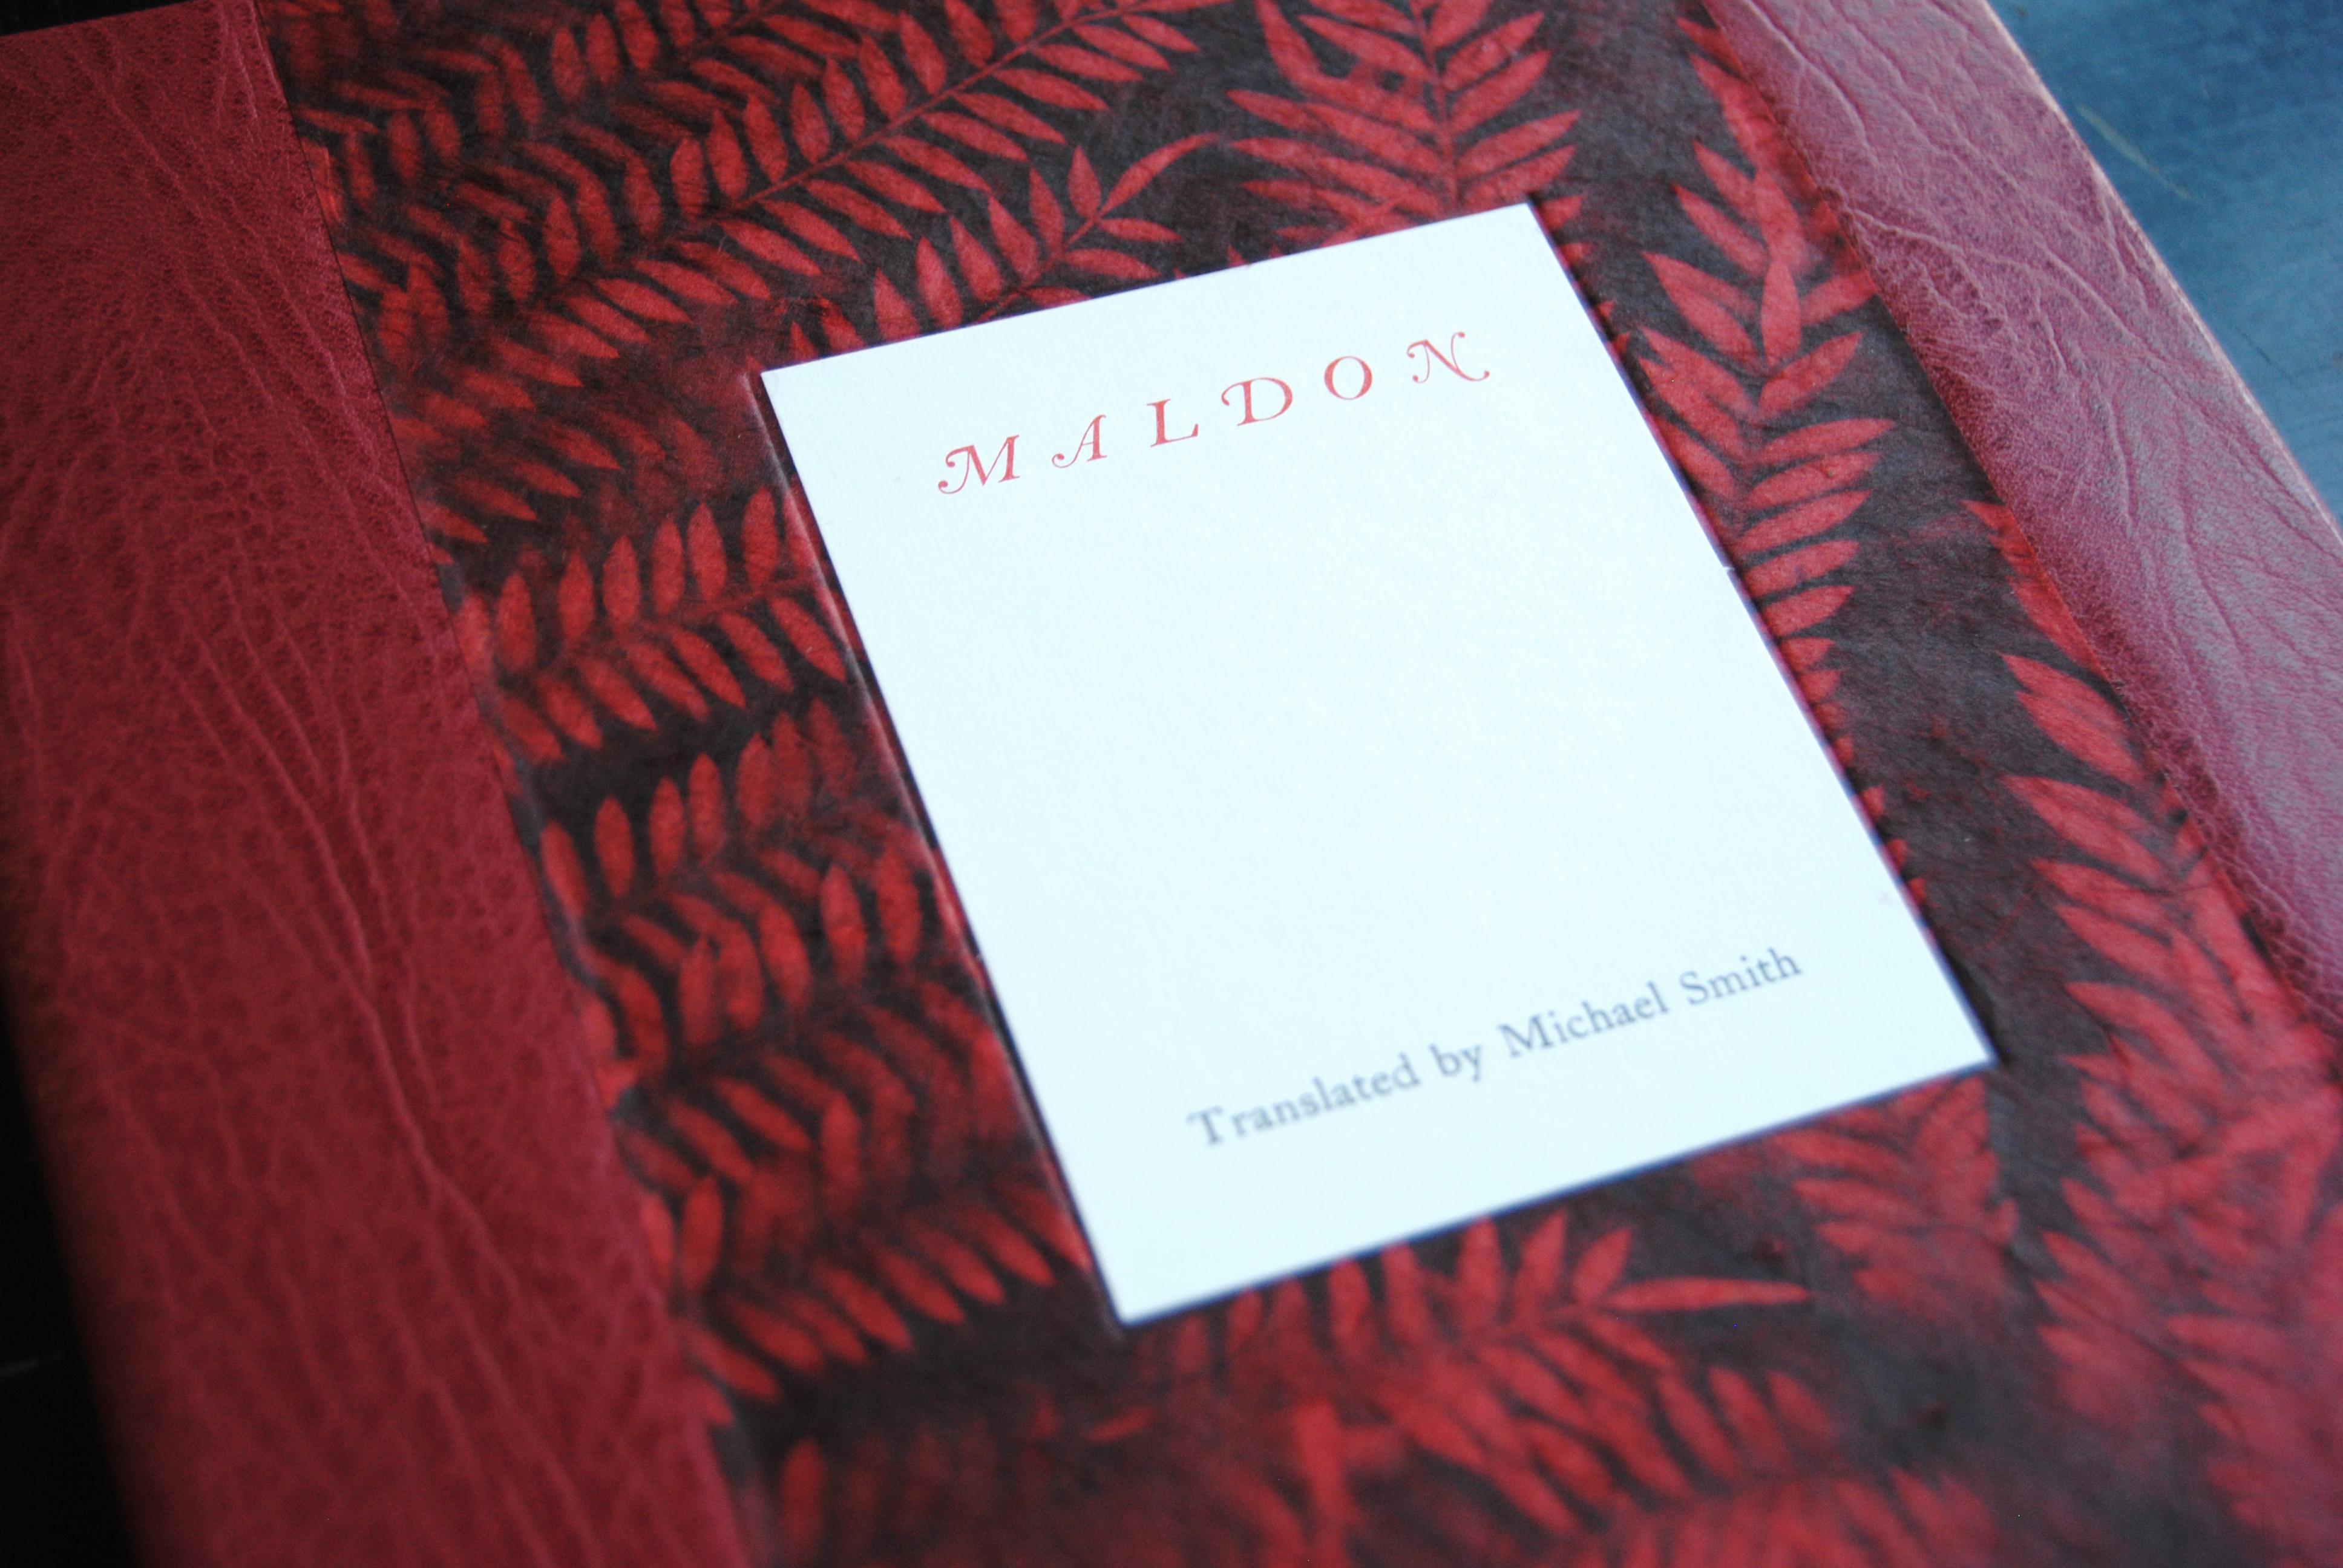 Cover image: Maldon